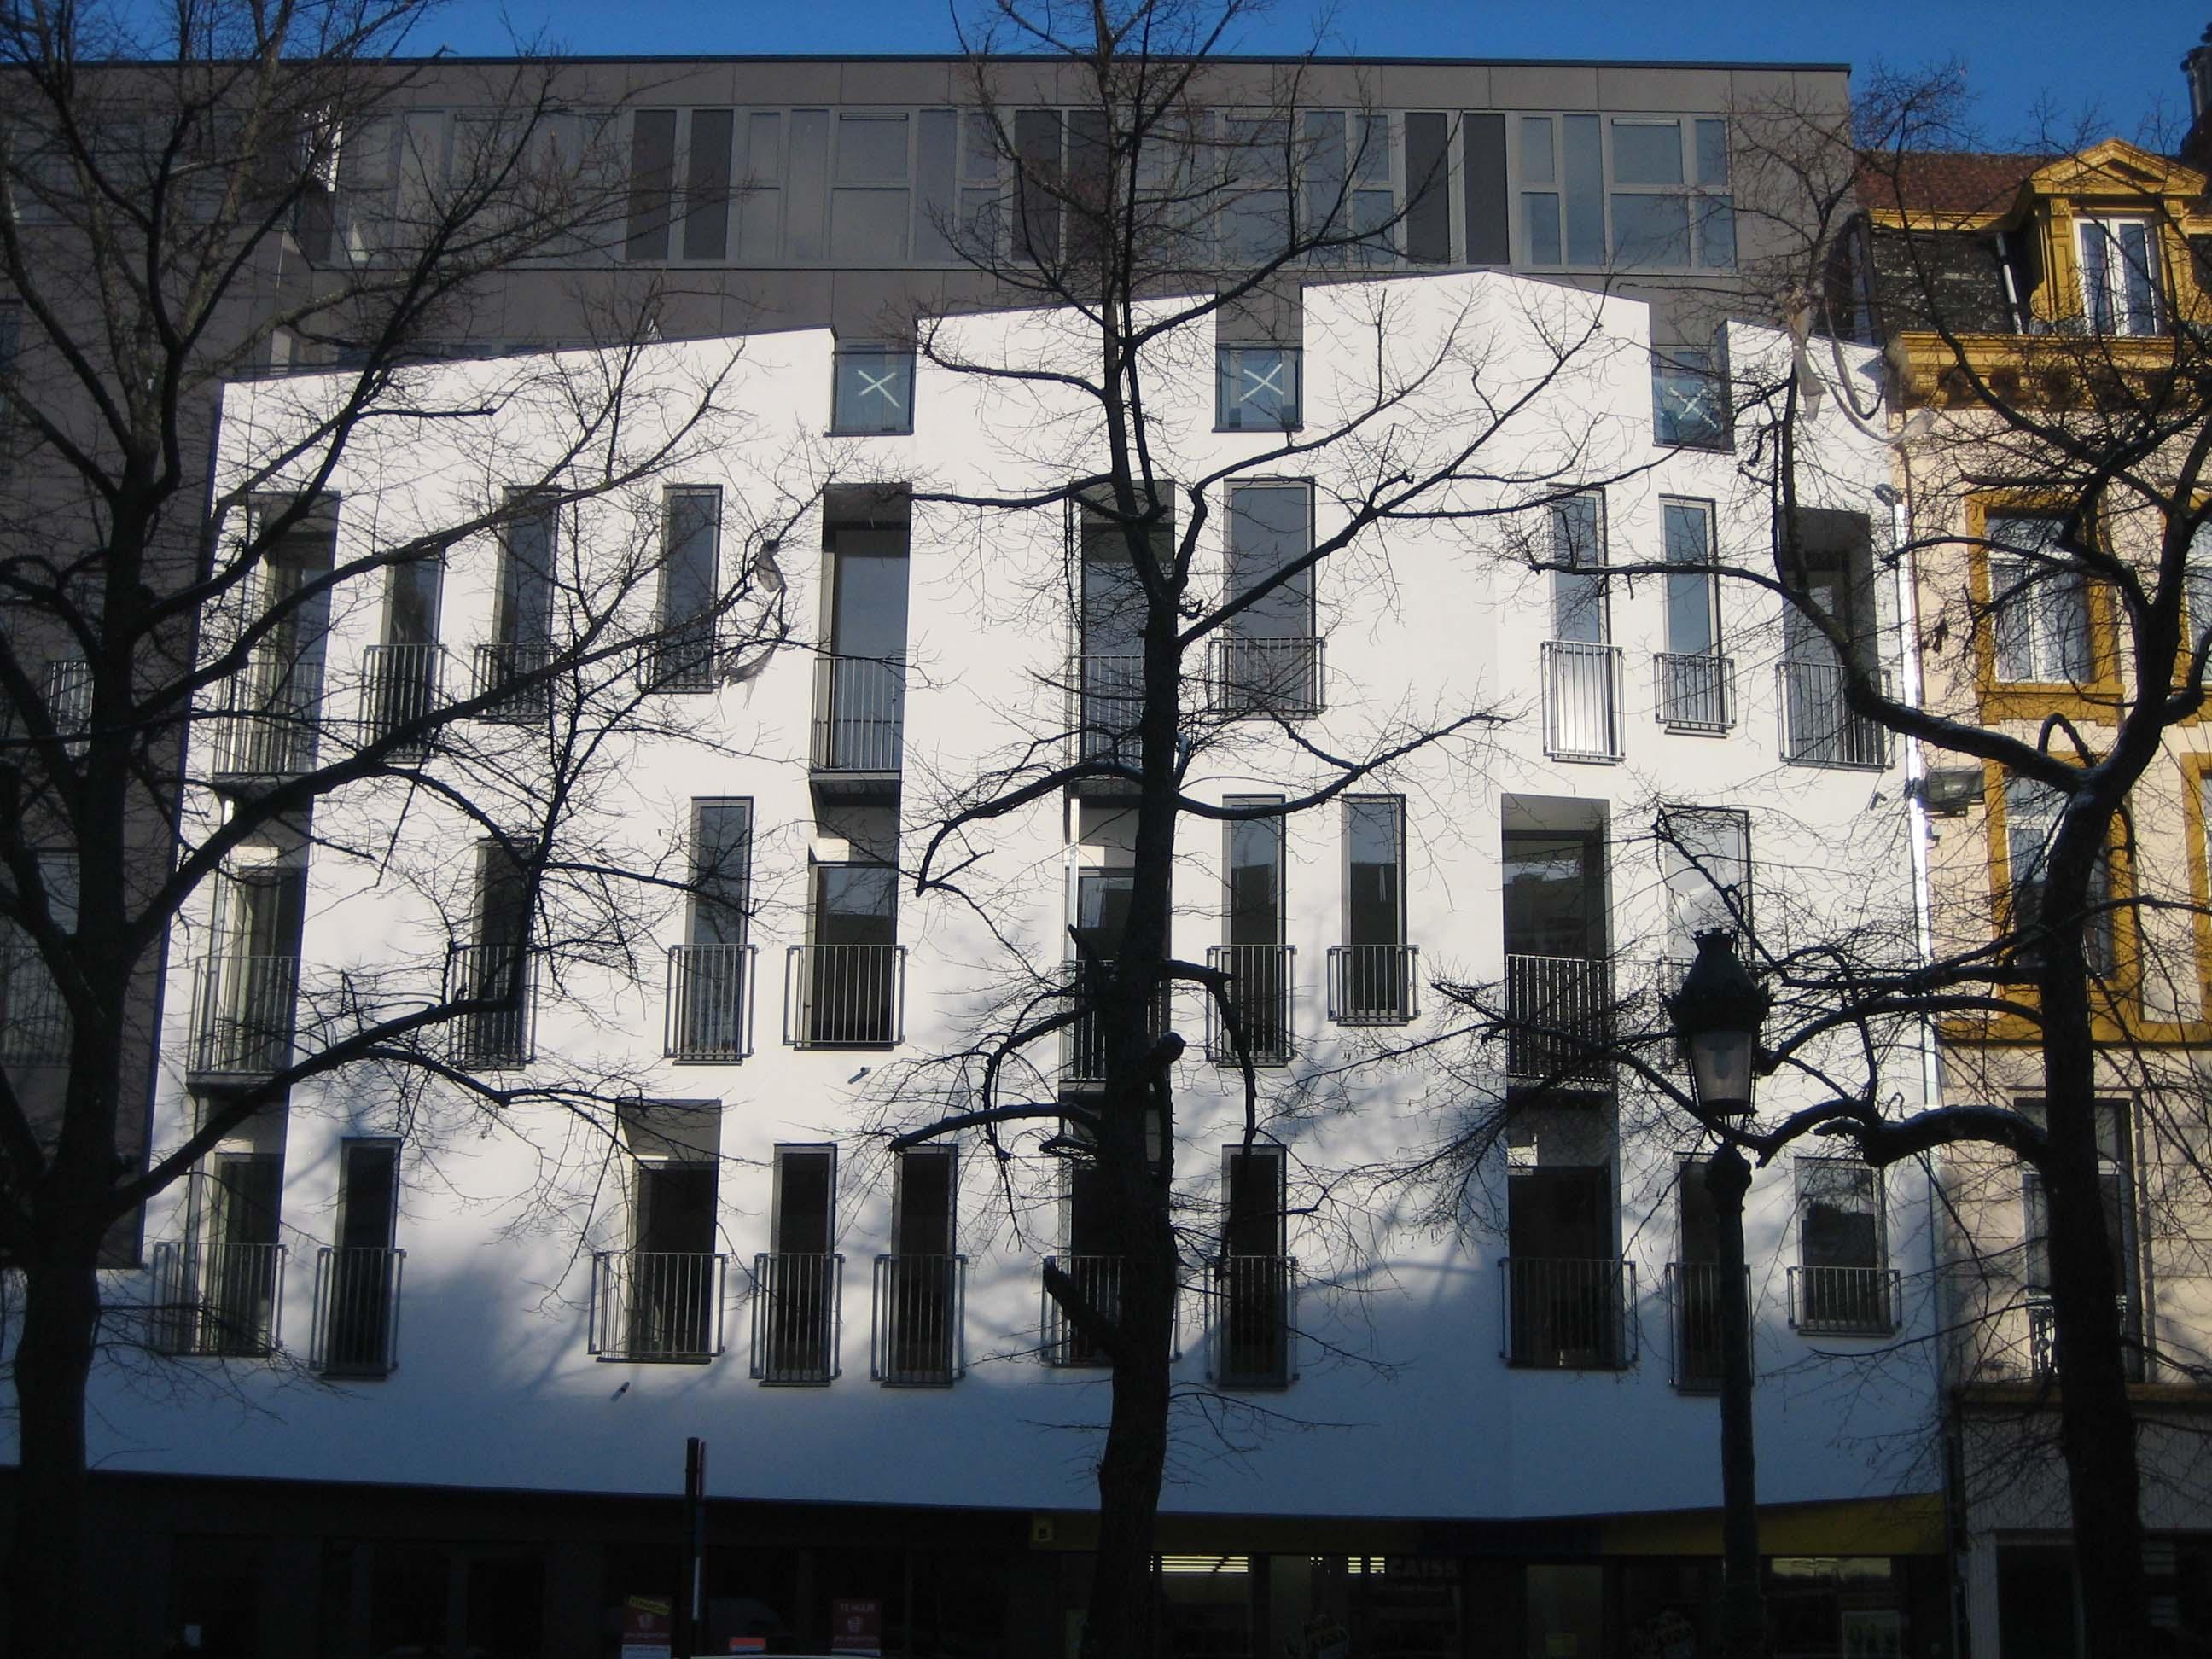 Lowette & Partners architects